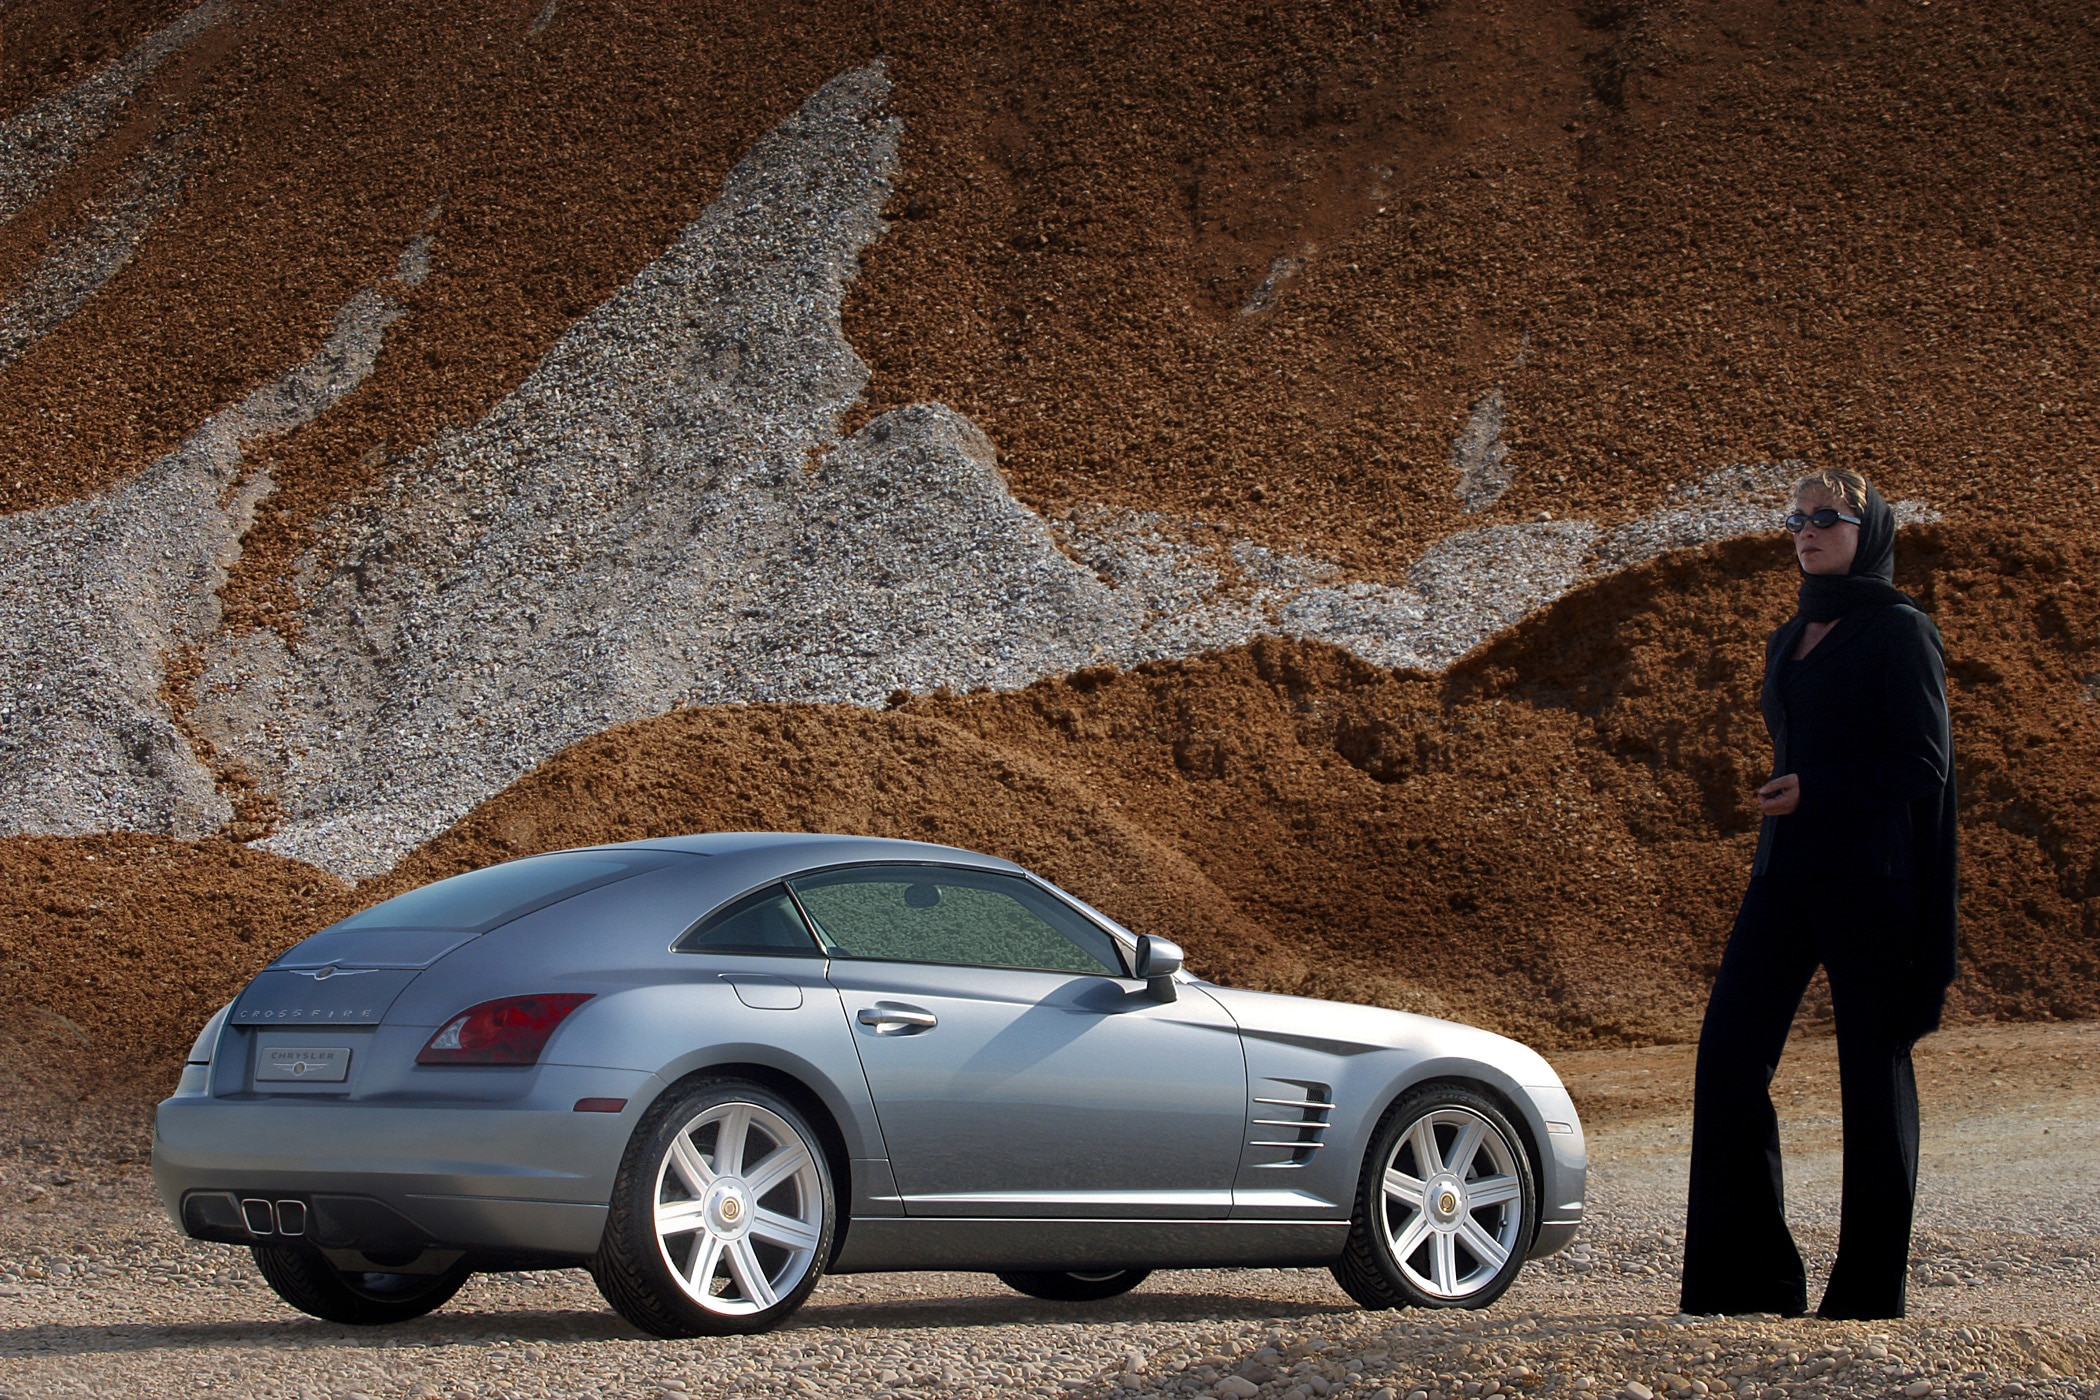 chrysler crossfire, chrysler, crossfire, mercedes-benz slk,. slk, mercedes slk, r170, american car, american, german car, germany, motoring, automotive, car, cars, classic car, retro car, not 2 grand, n2g, not2grand